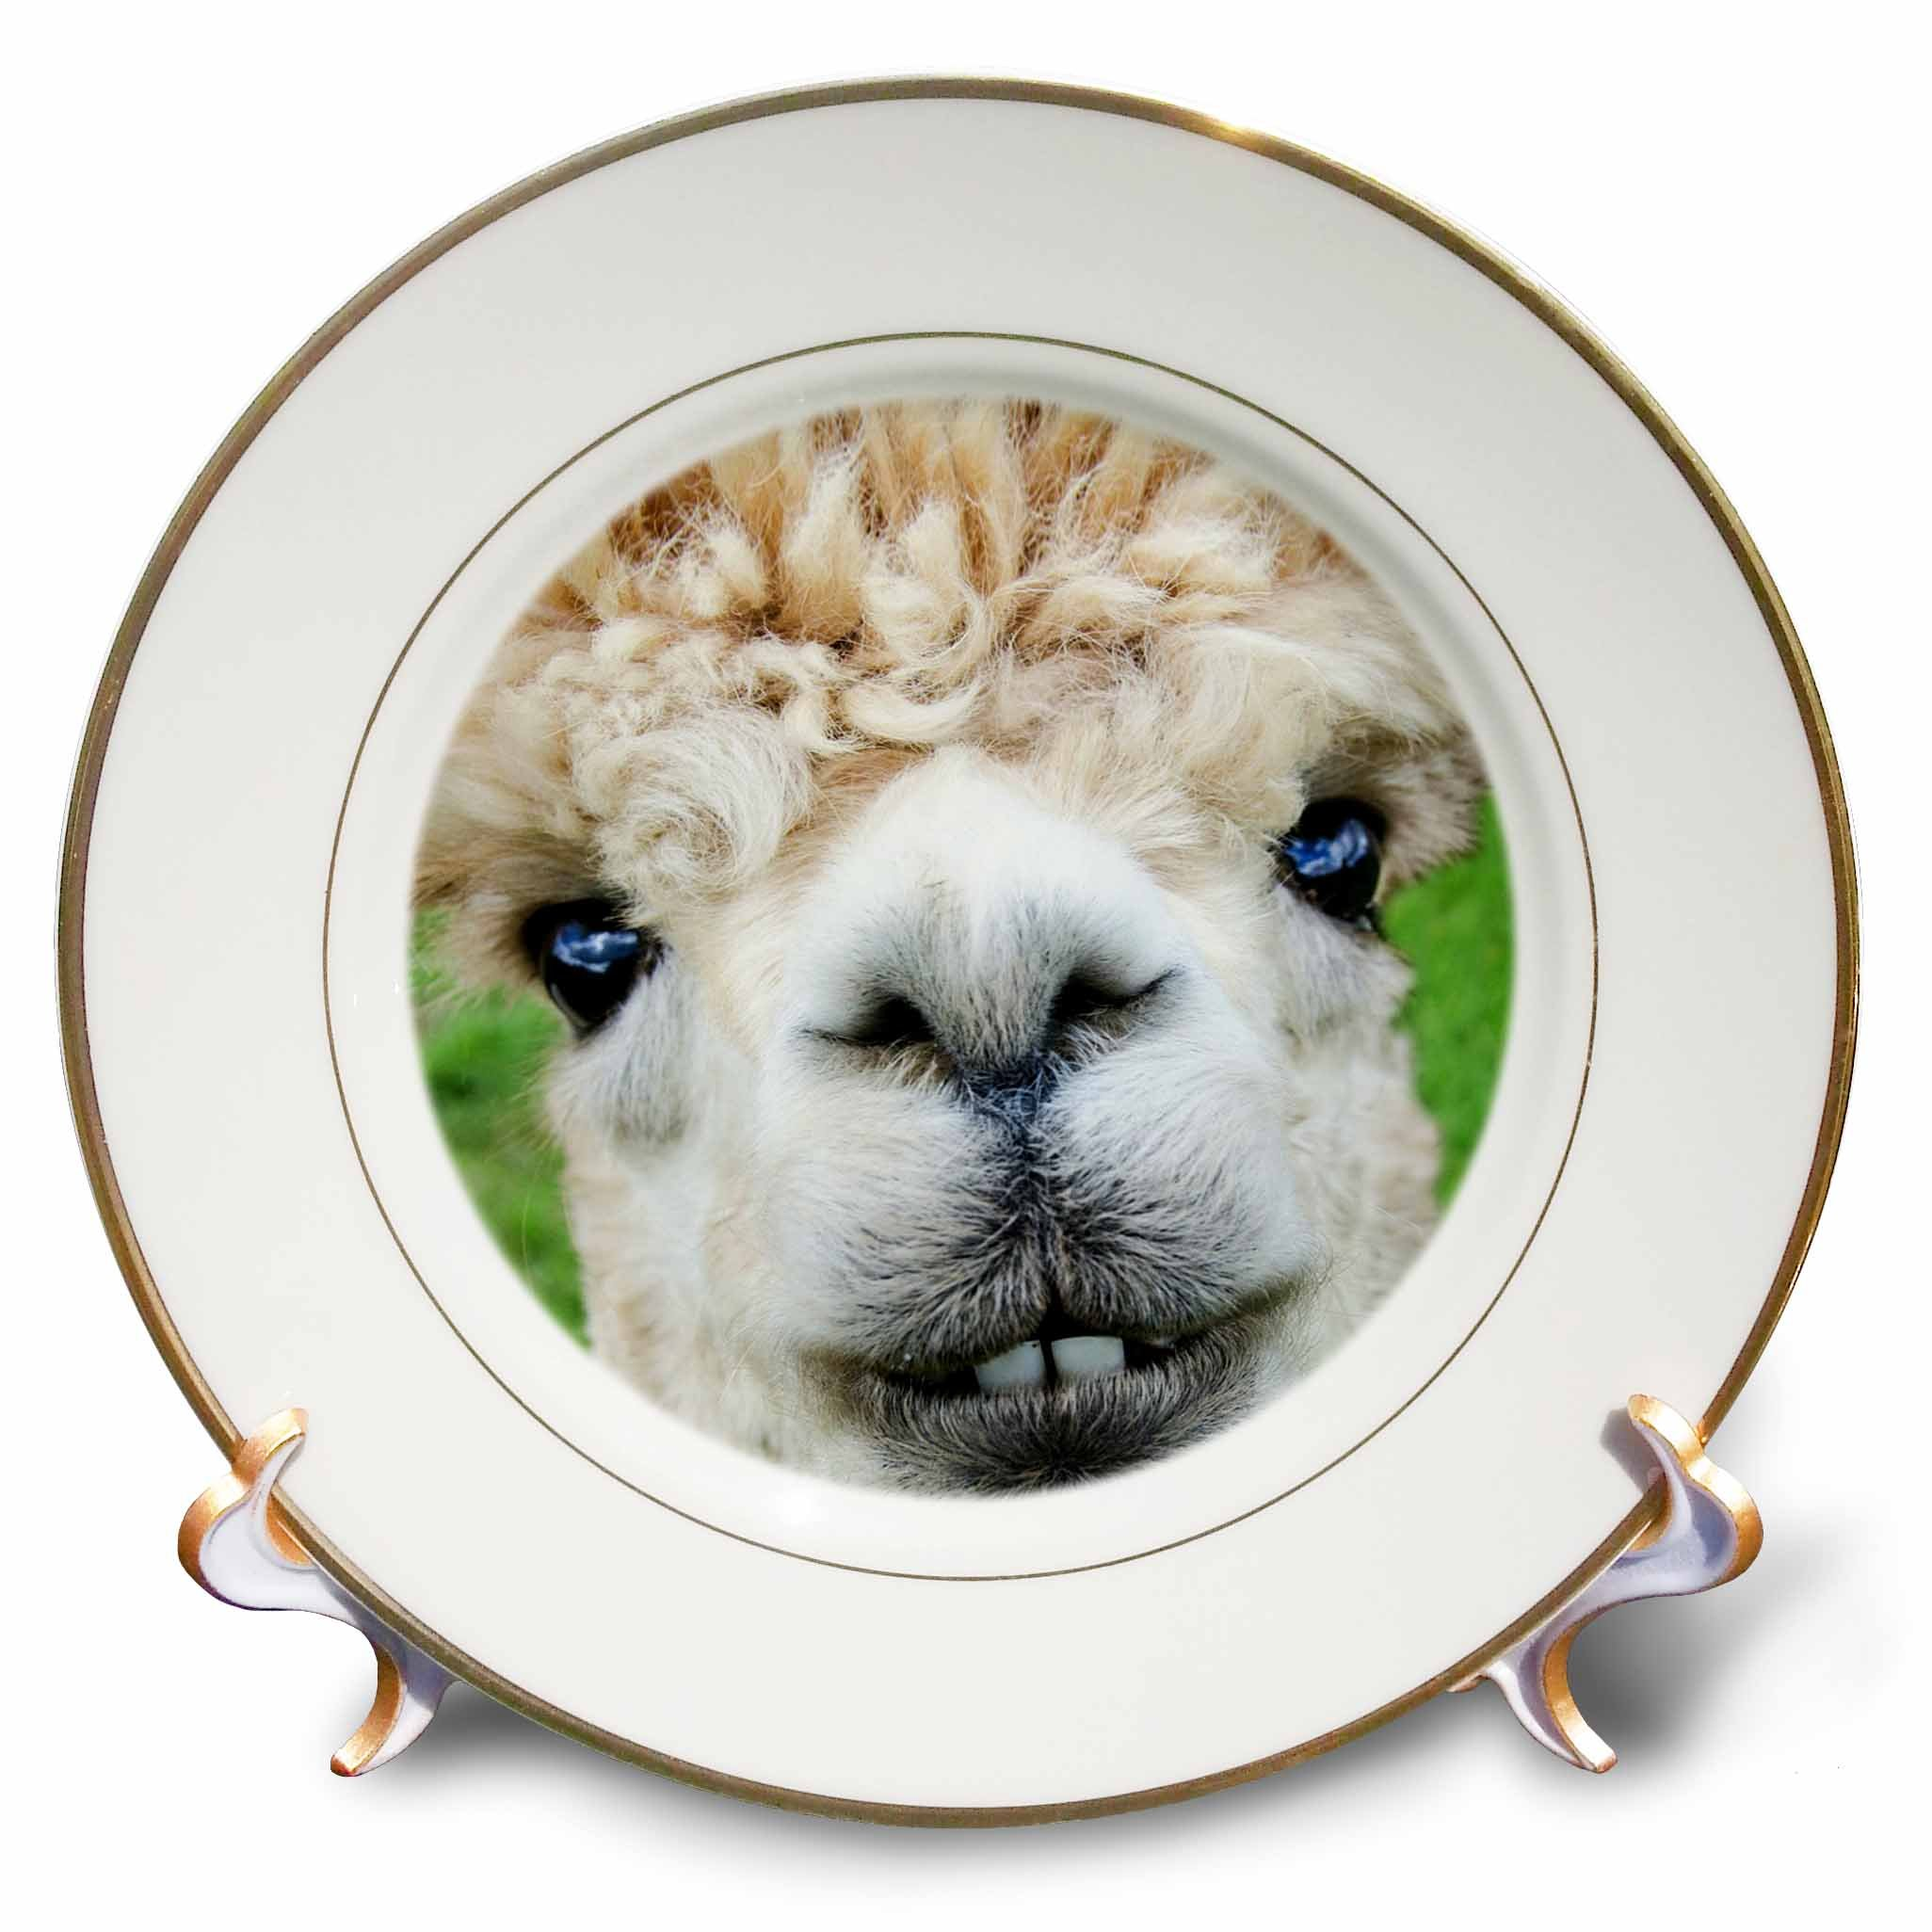 RinaPiro - Domestic Animals - Alpaca. Lama. South America. White. - 8 inch Porcelain Plate (cp_237102_1)